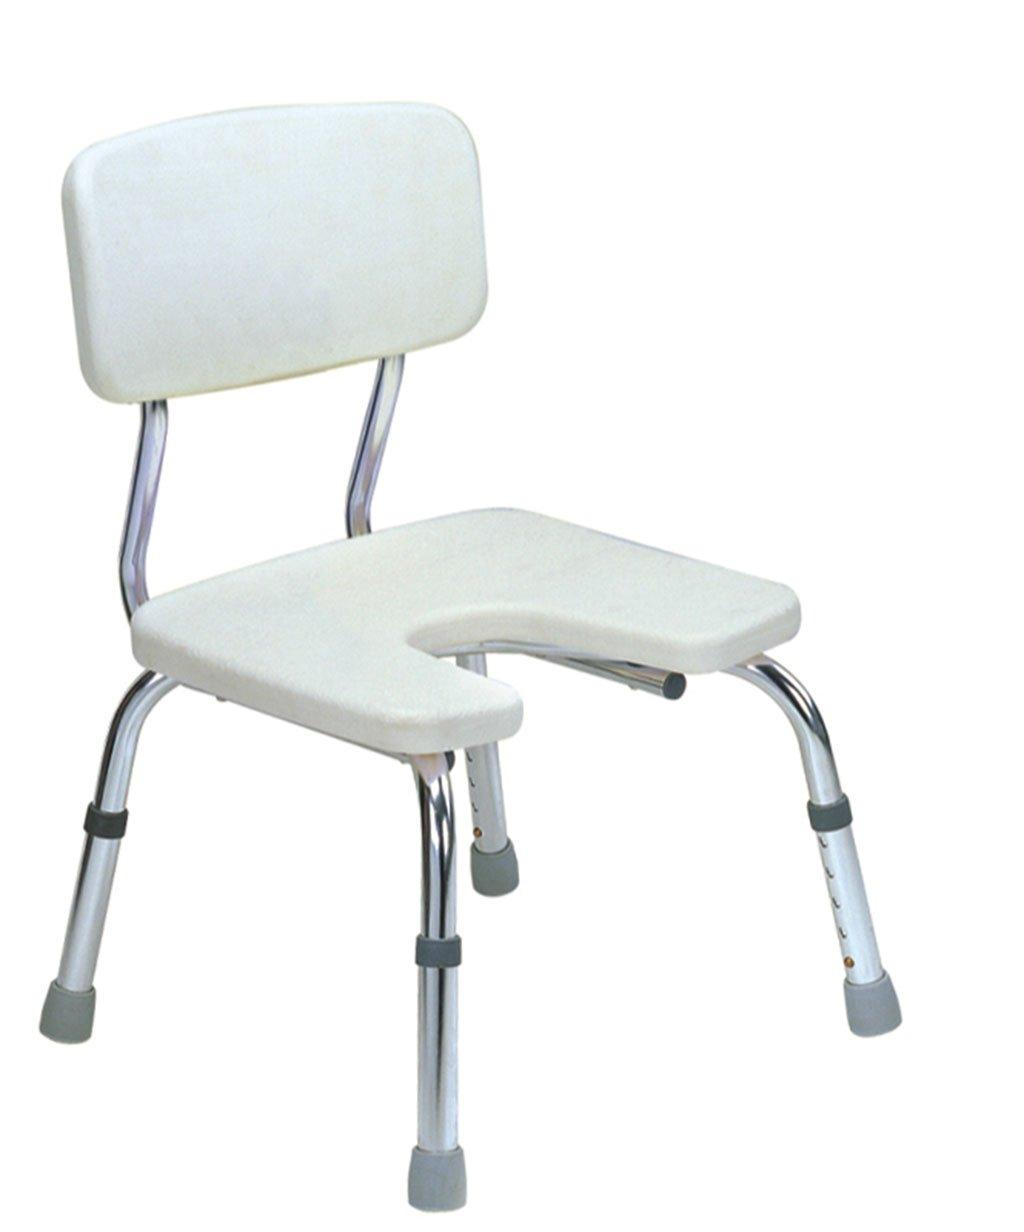 GRJH® シャワー椅子、高さ調節可能なノンスリップ妊婦バスチェアバスルームアルミ合金シャワーチェア 防水,環境の快適さ   B079GL3X7P